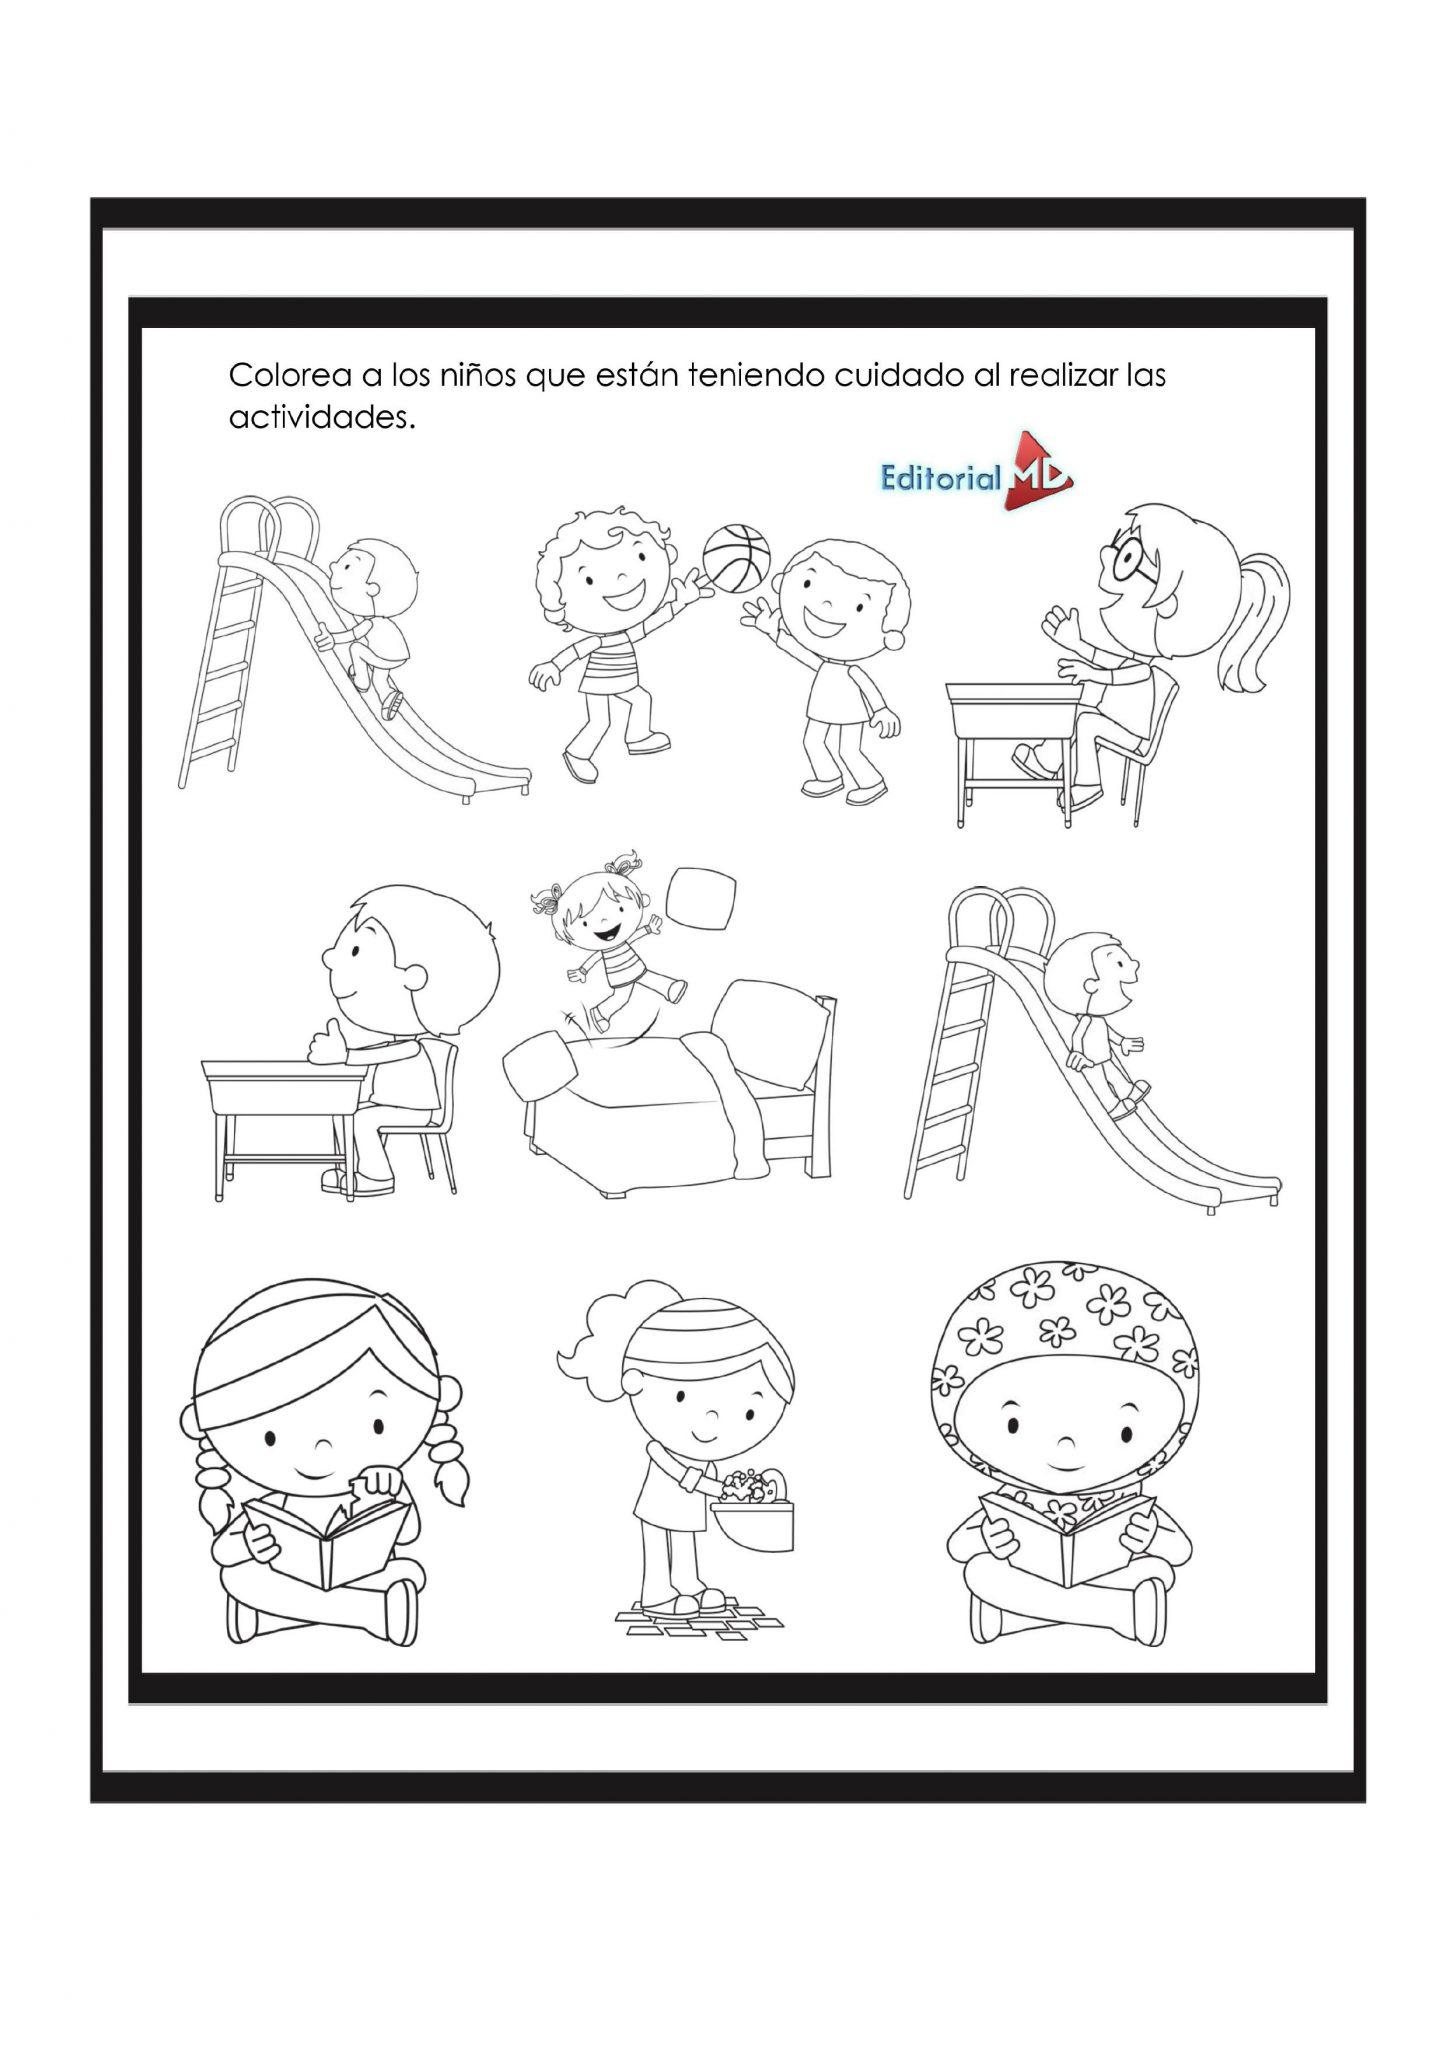 Ejemplo Material de apoyo semana 34 preescolar 02